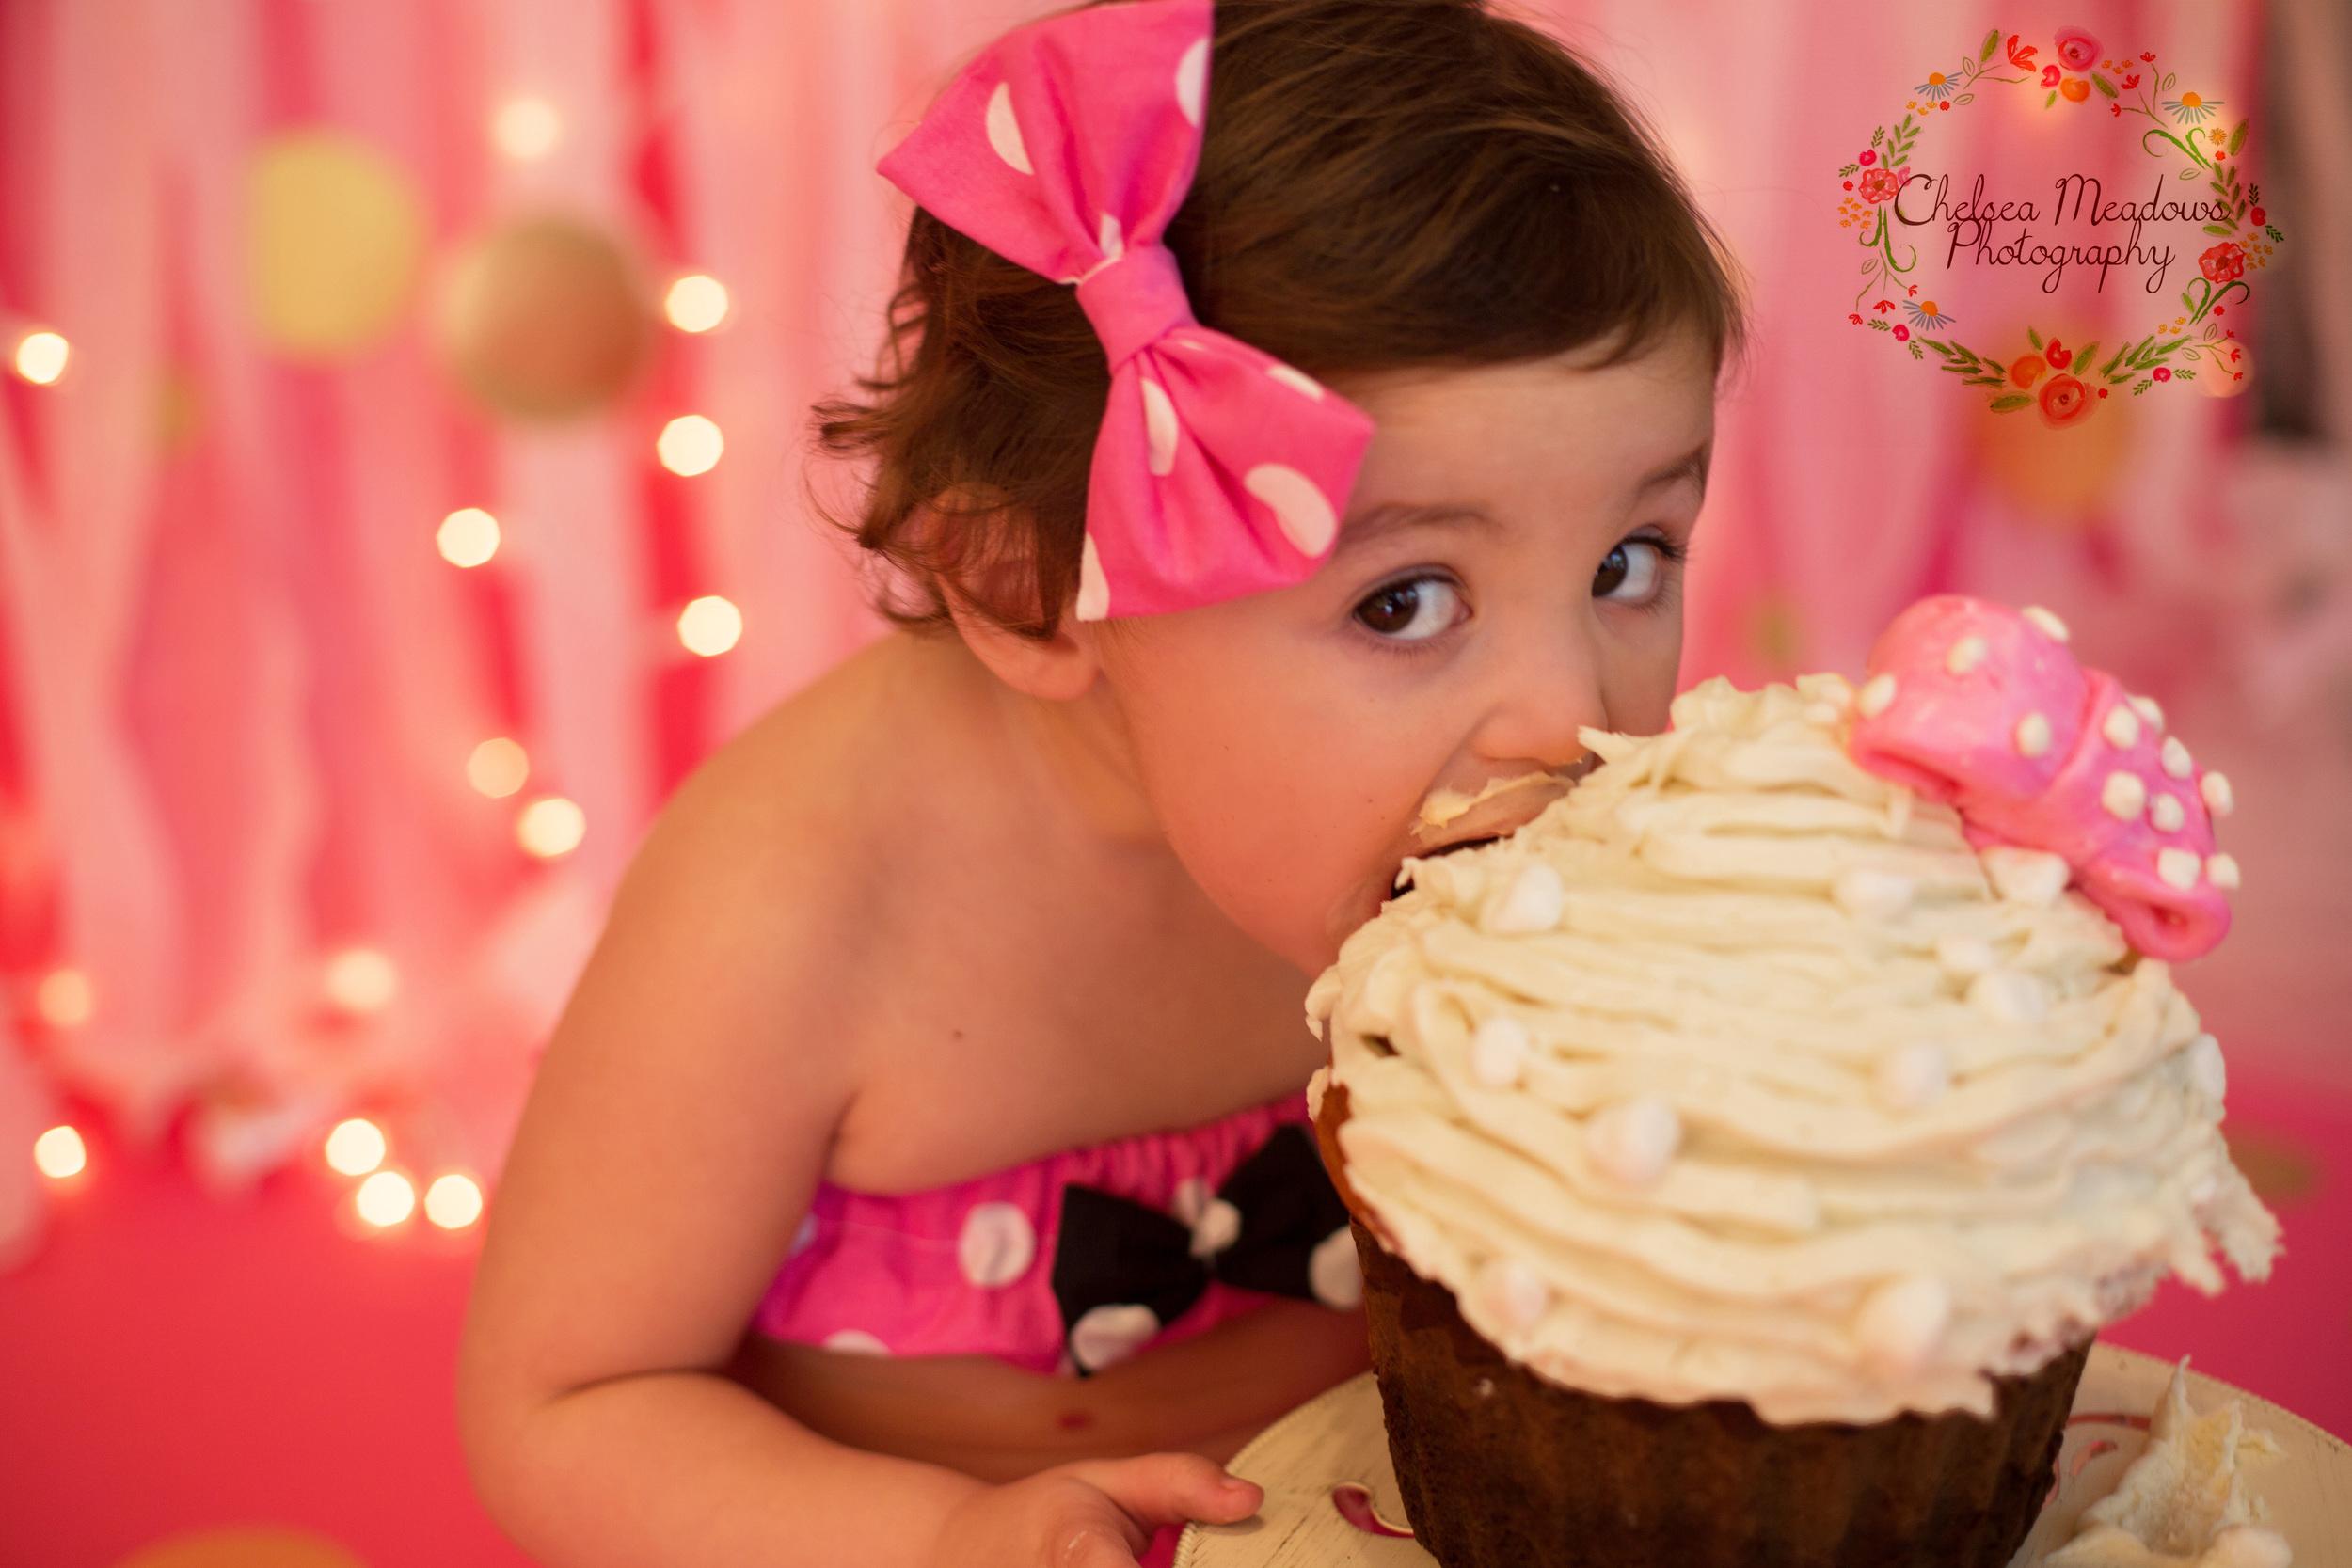 Graylin's Second Birthday - Social Media - Chelsea Meadows Photography (41).jpg